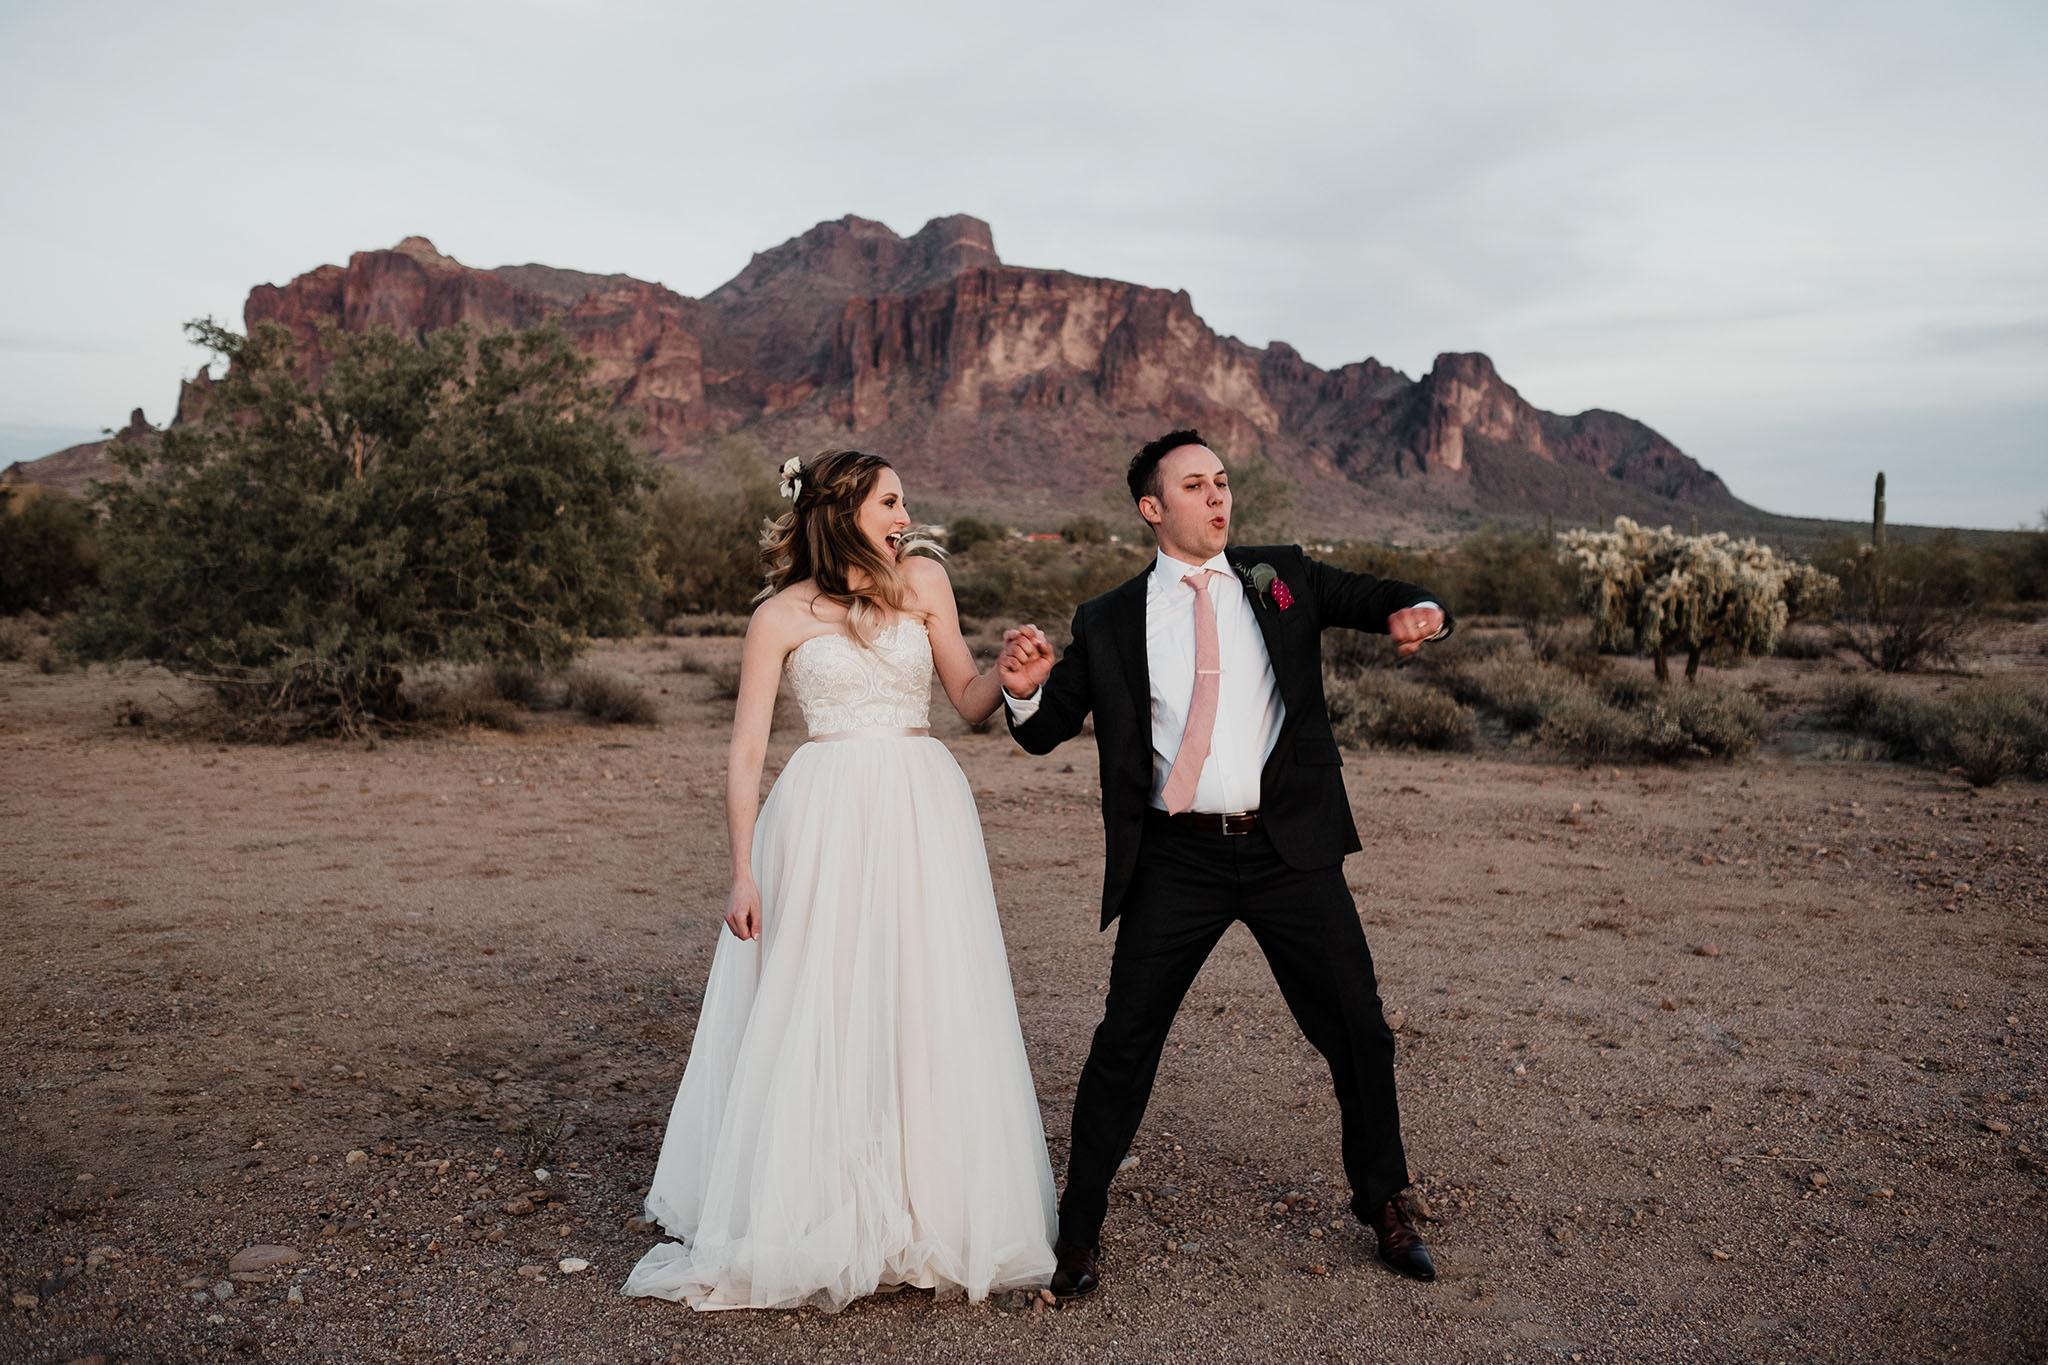 Arizona-Wedding-Photographer-The-Paseo-Venue37.jpg